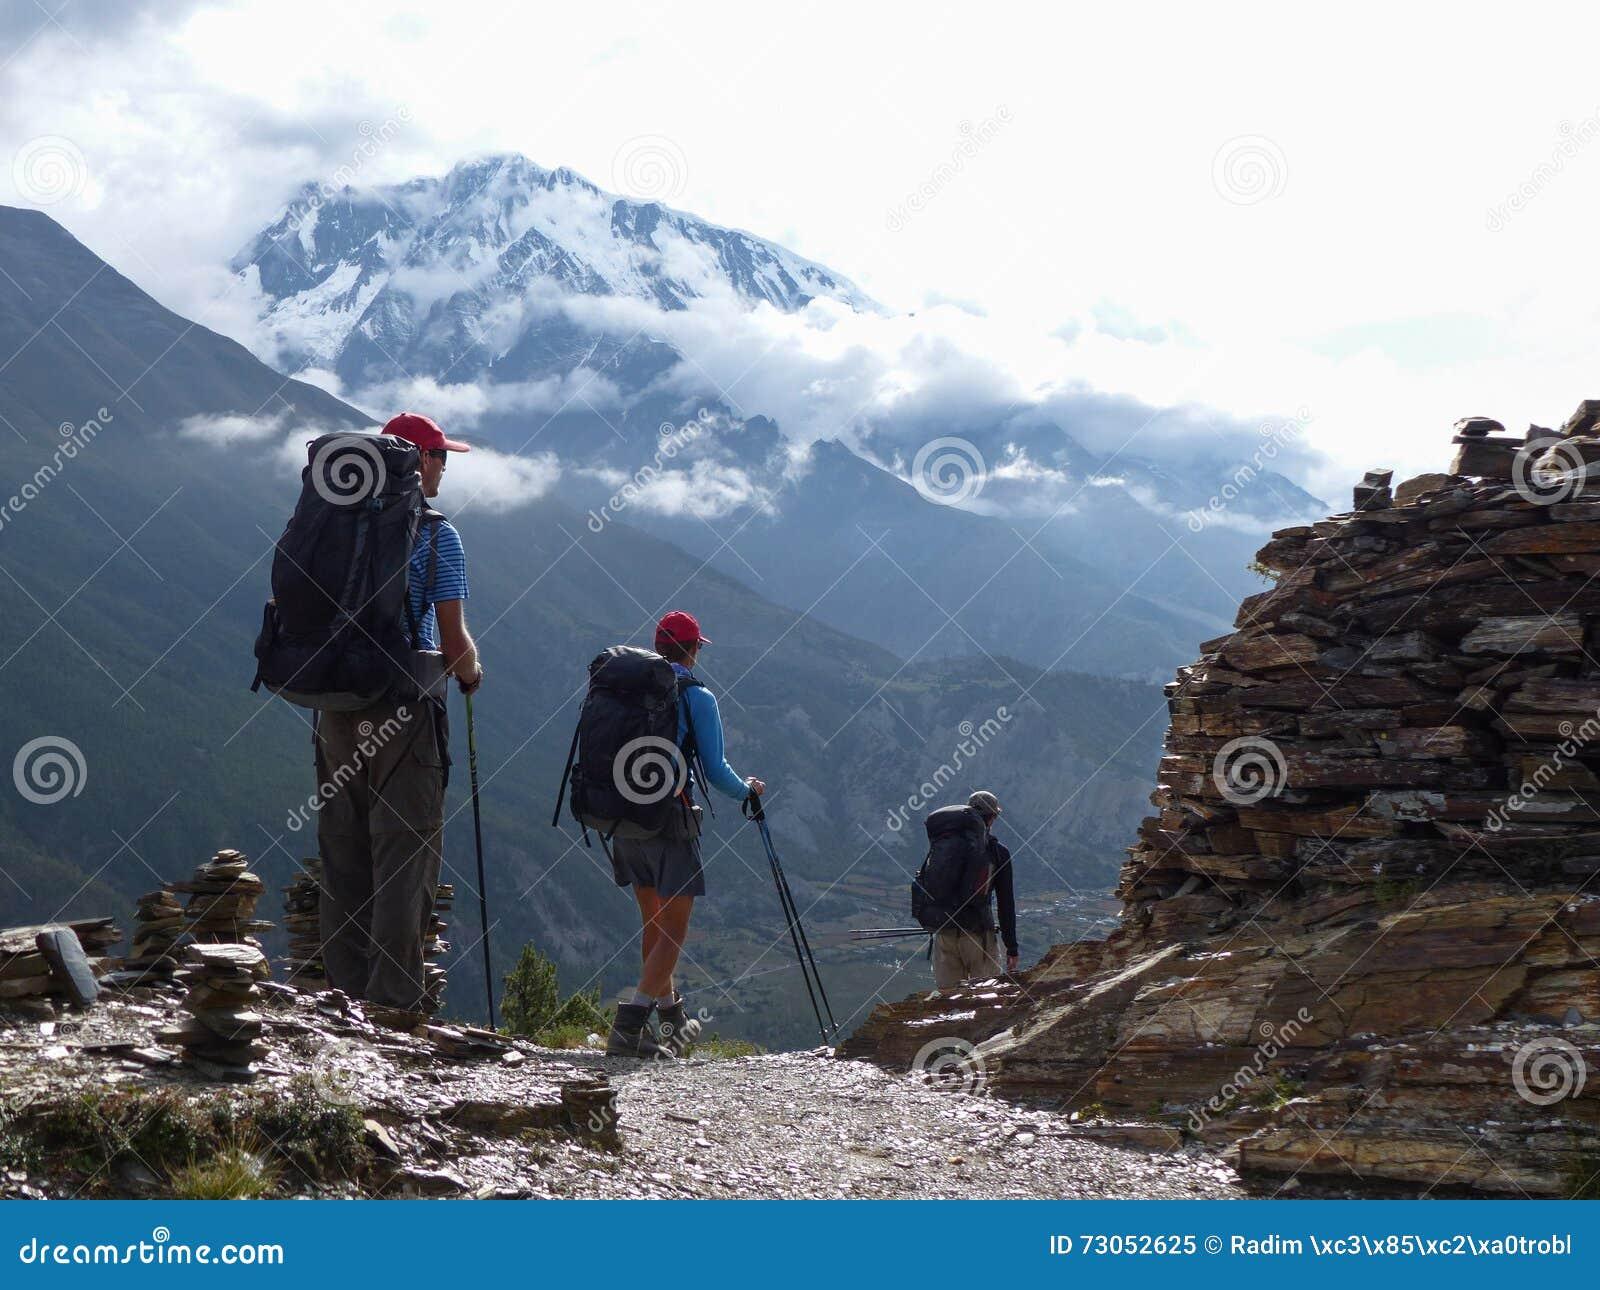 Hikers in autumnal Himalaya, view to Annapurna III